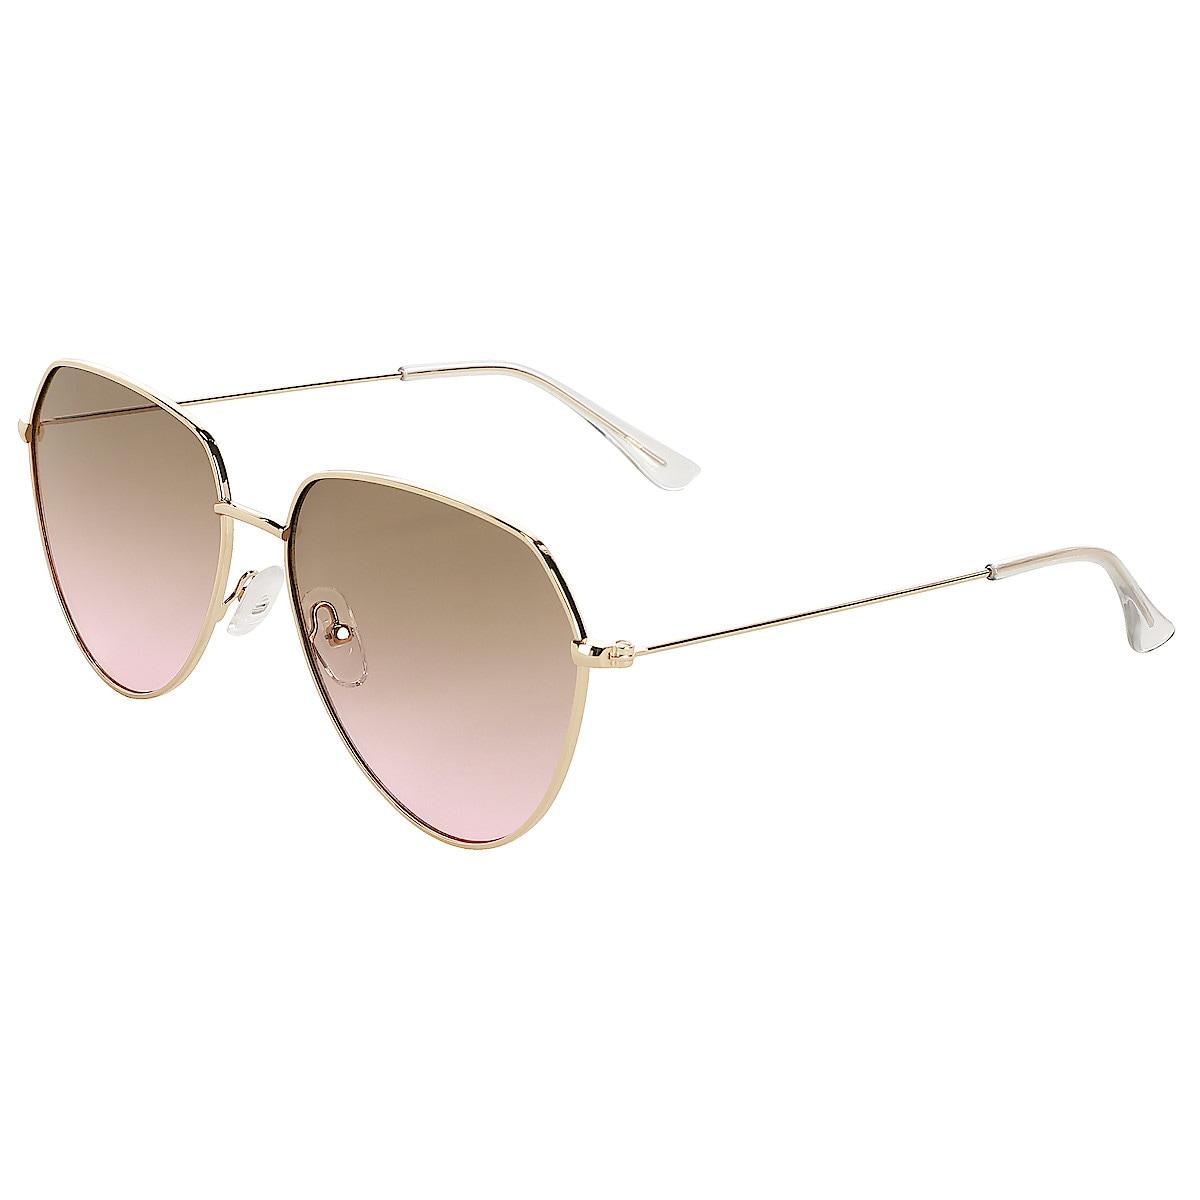 Solglasögon metall, pilotmodell